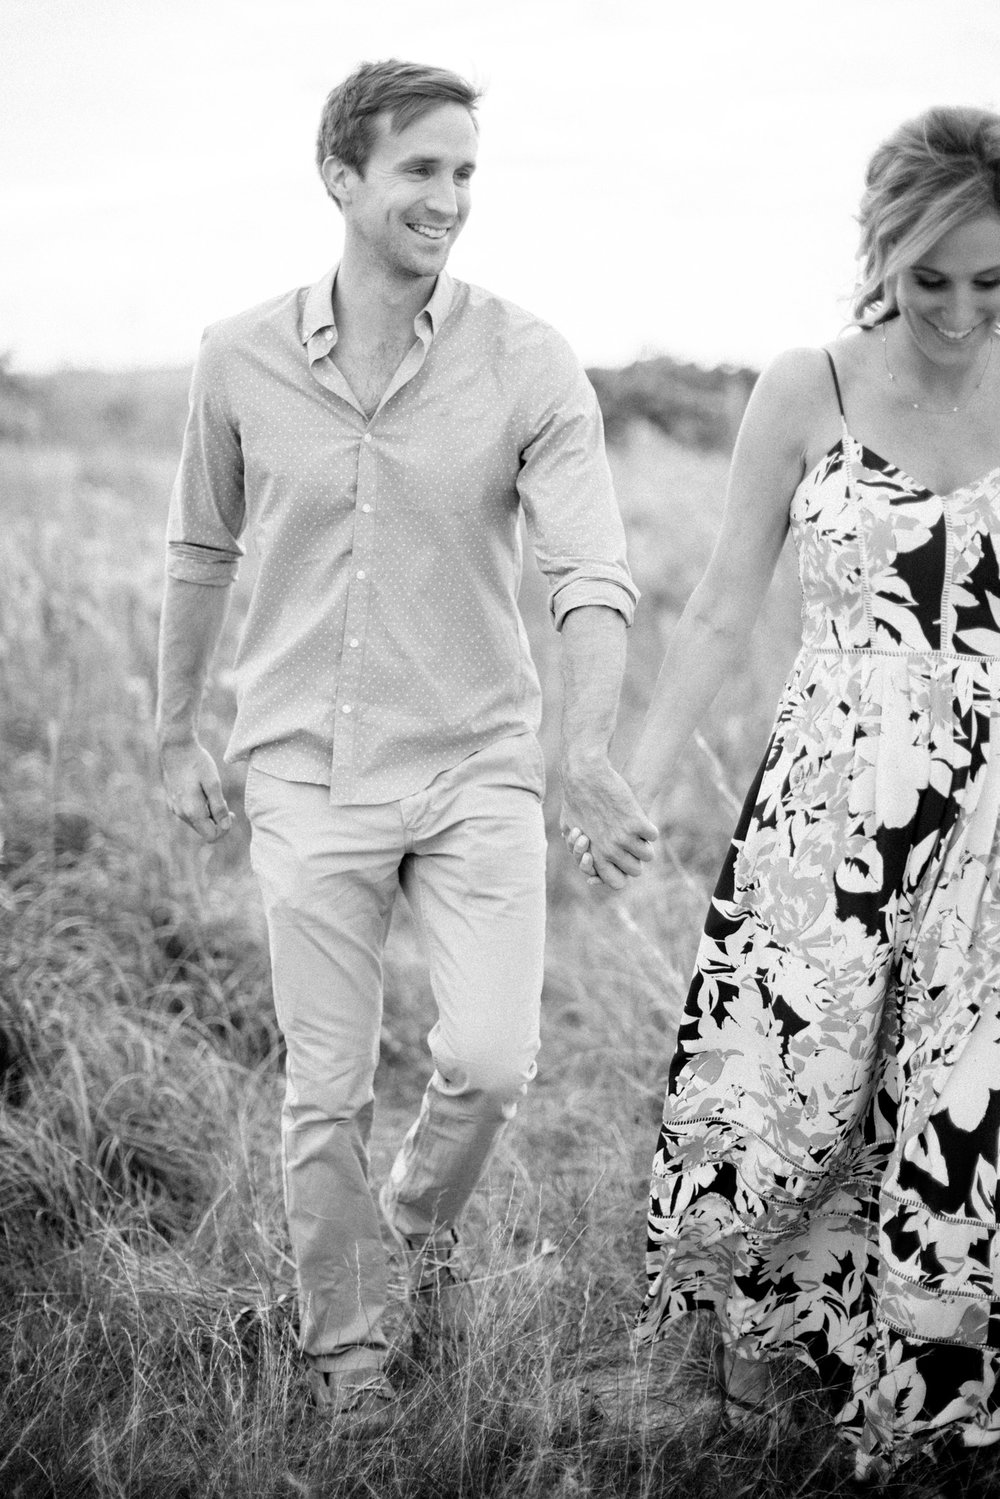 lido-key-sarasota-wedding-photographer-hunter-ryan-photo-08241-2.jpg